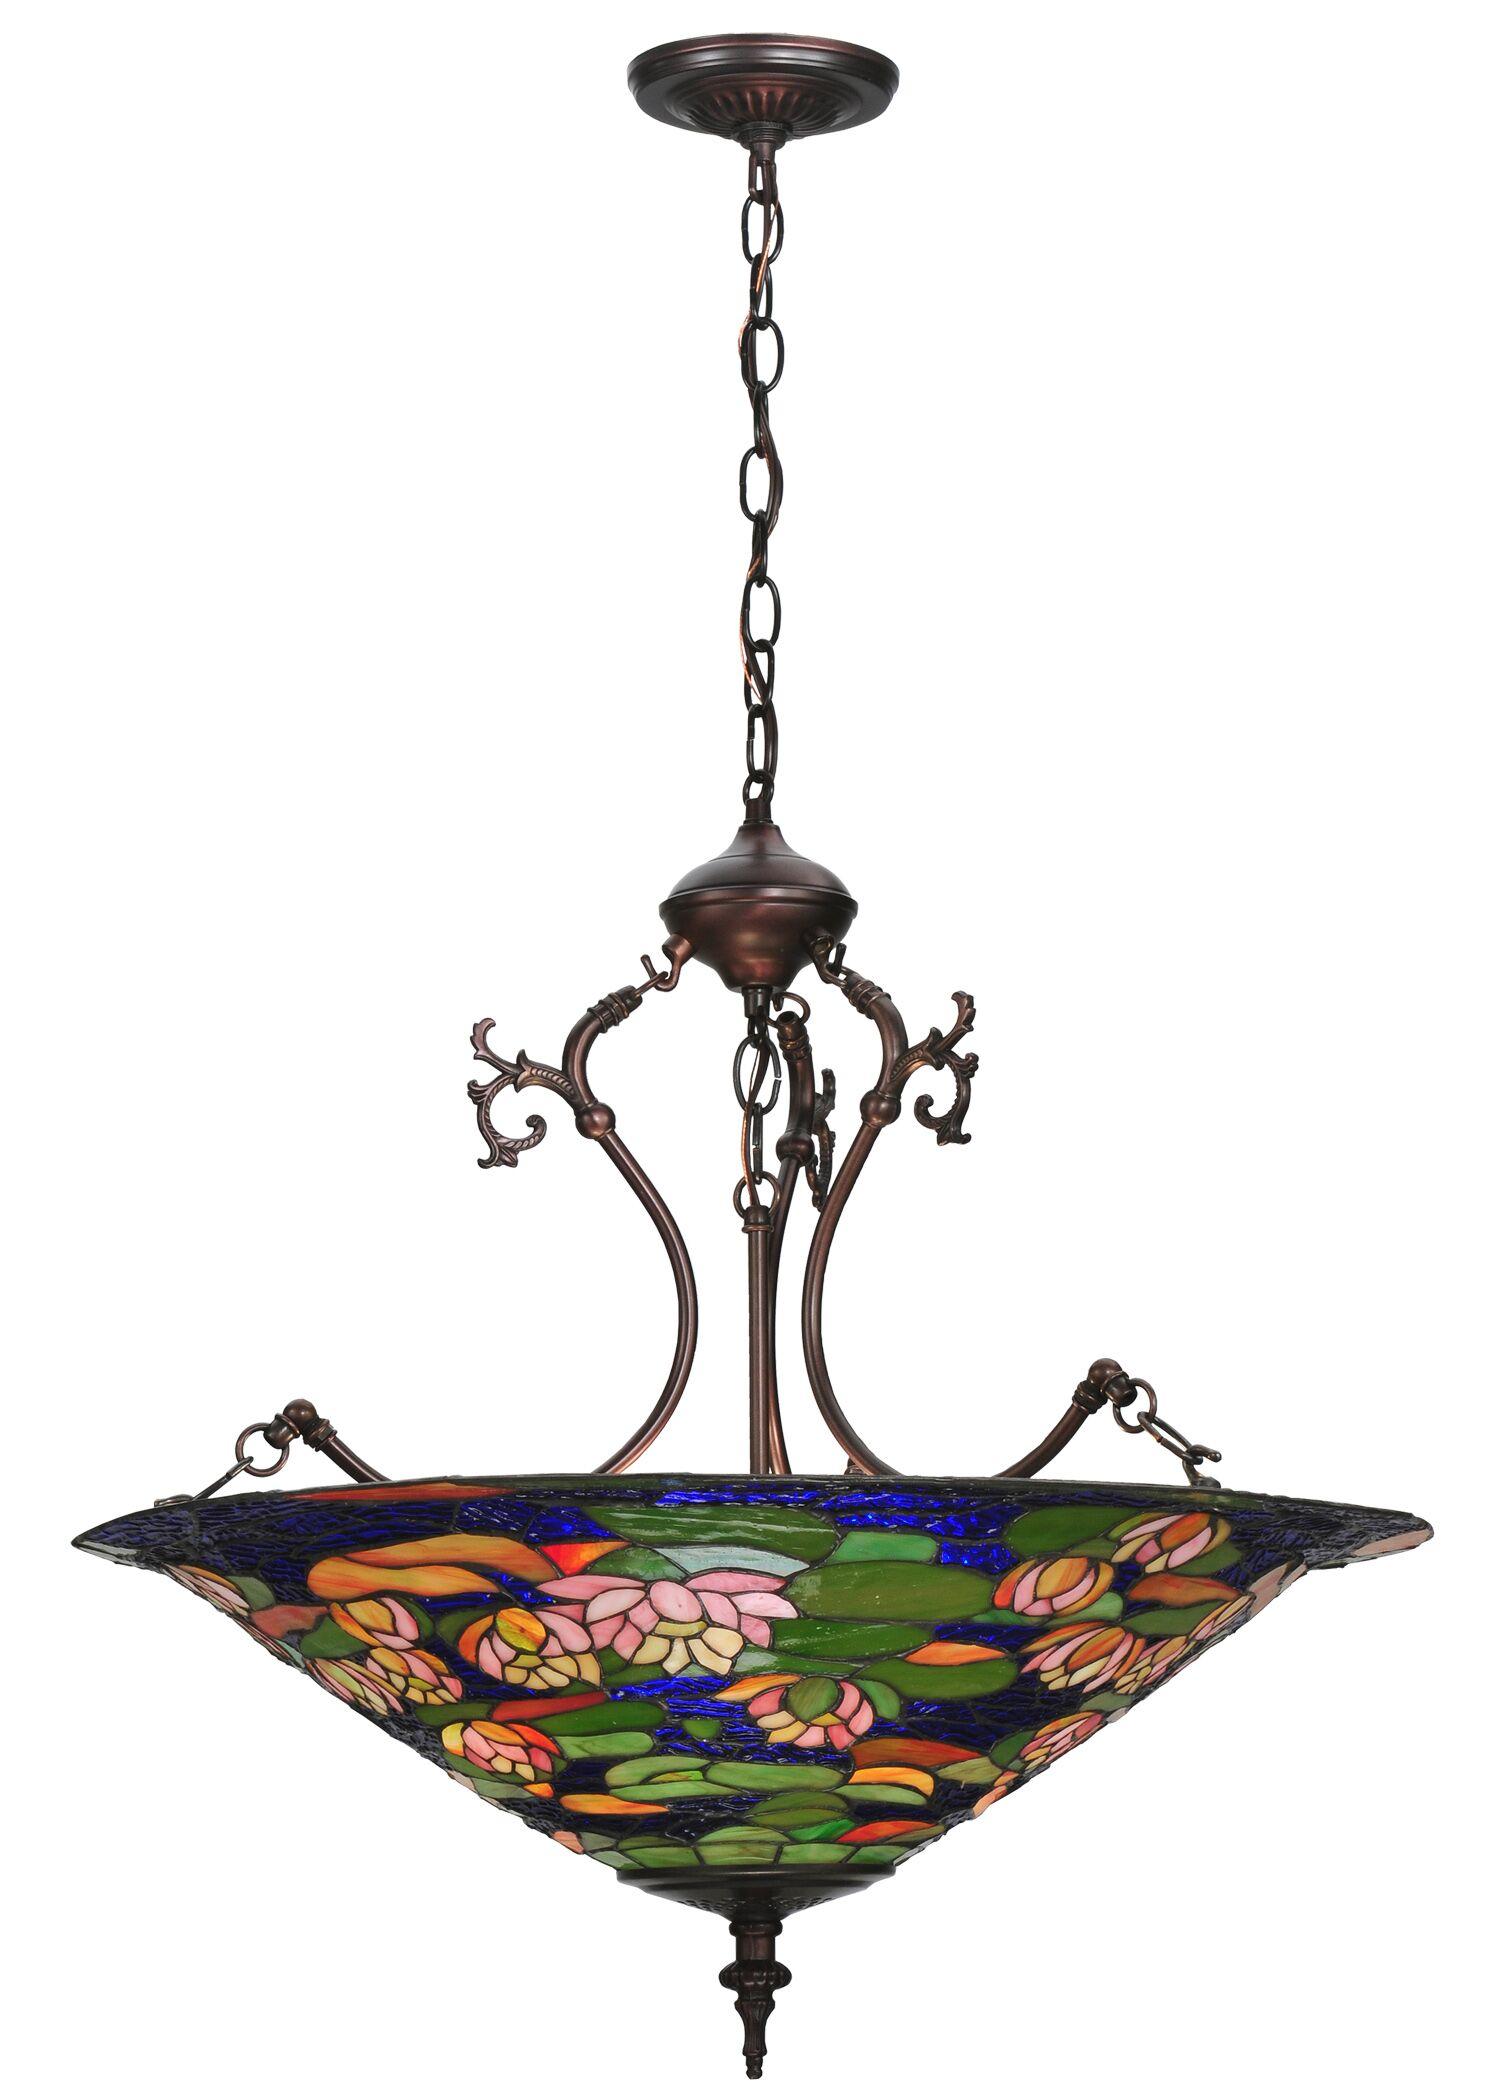 Tiffany Pond Lily 3-Light Bowl Pendant